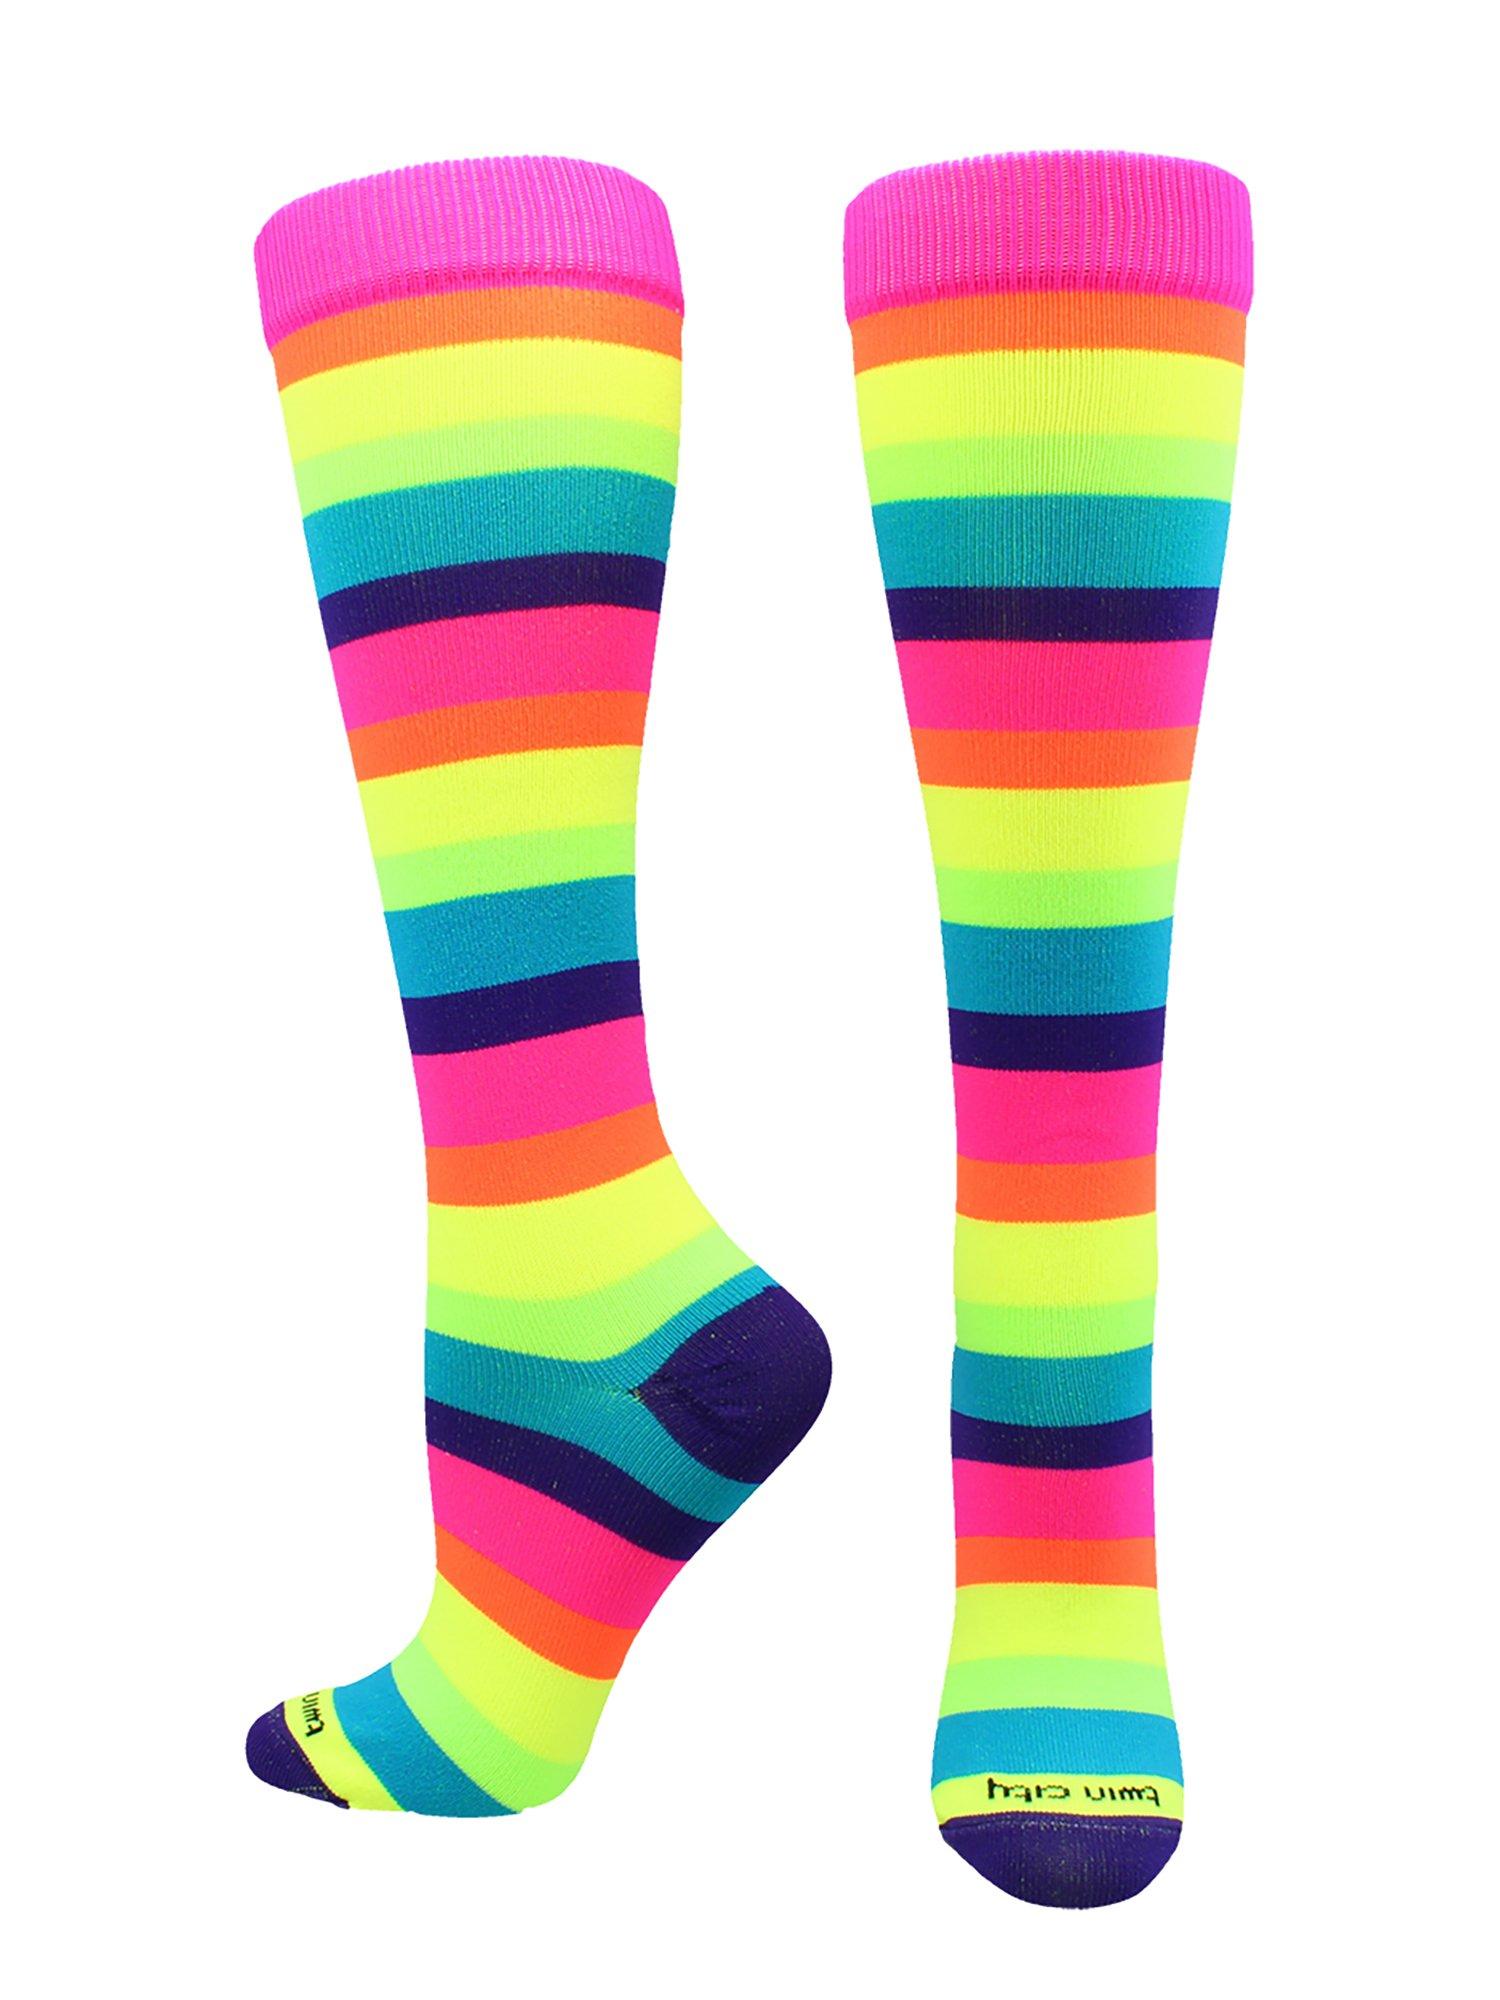 70767317a TCK Sports Krazisox Rainbow Stripes Over the Calf Socks product image